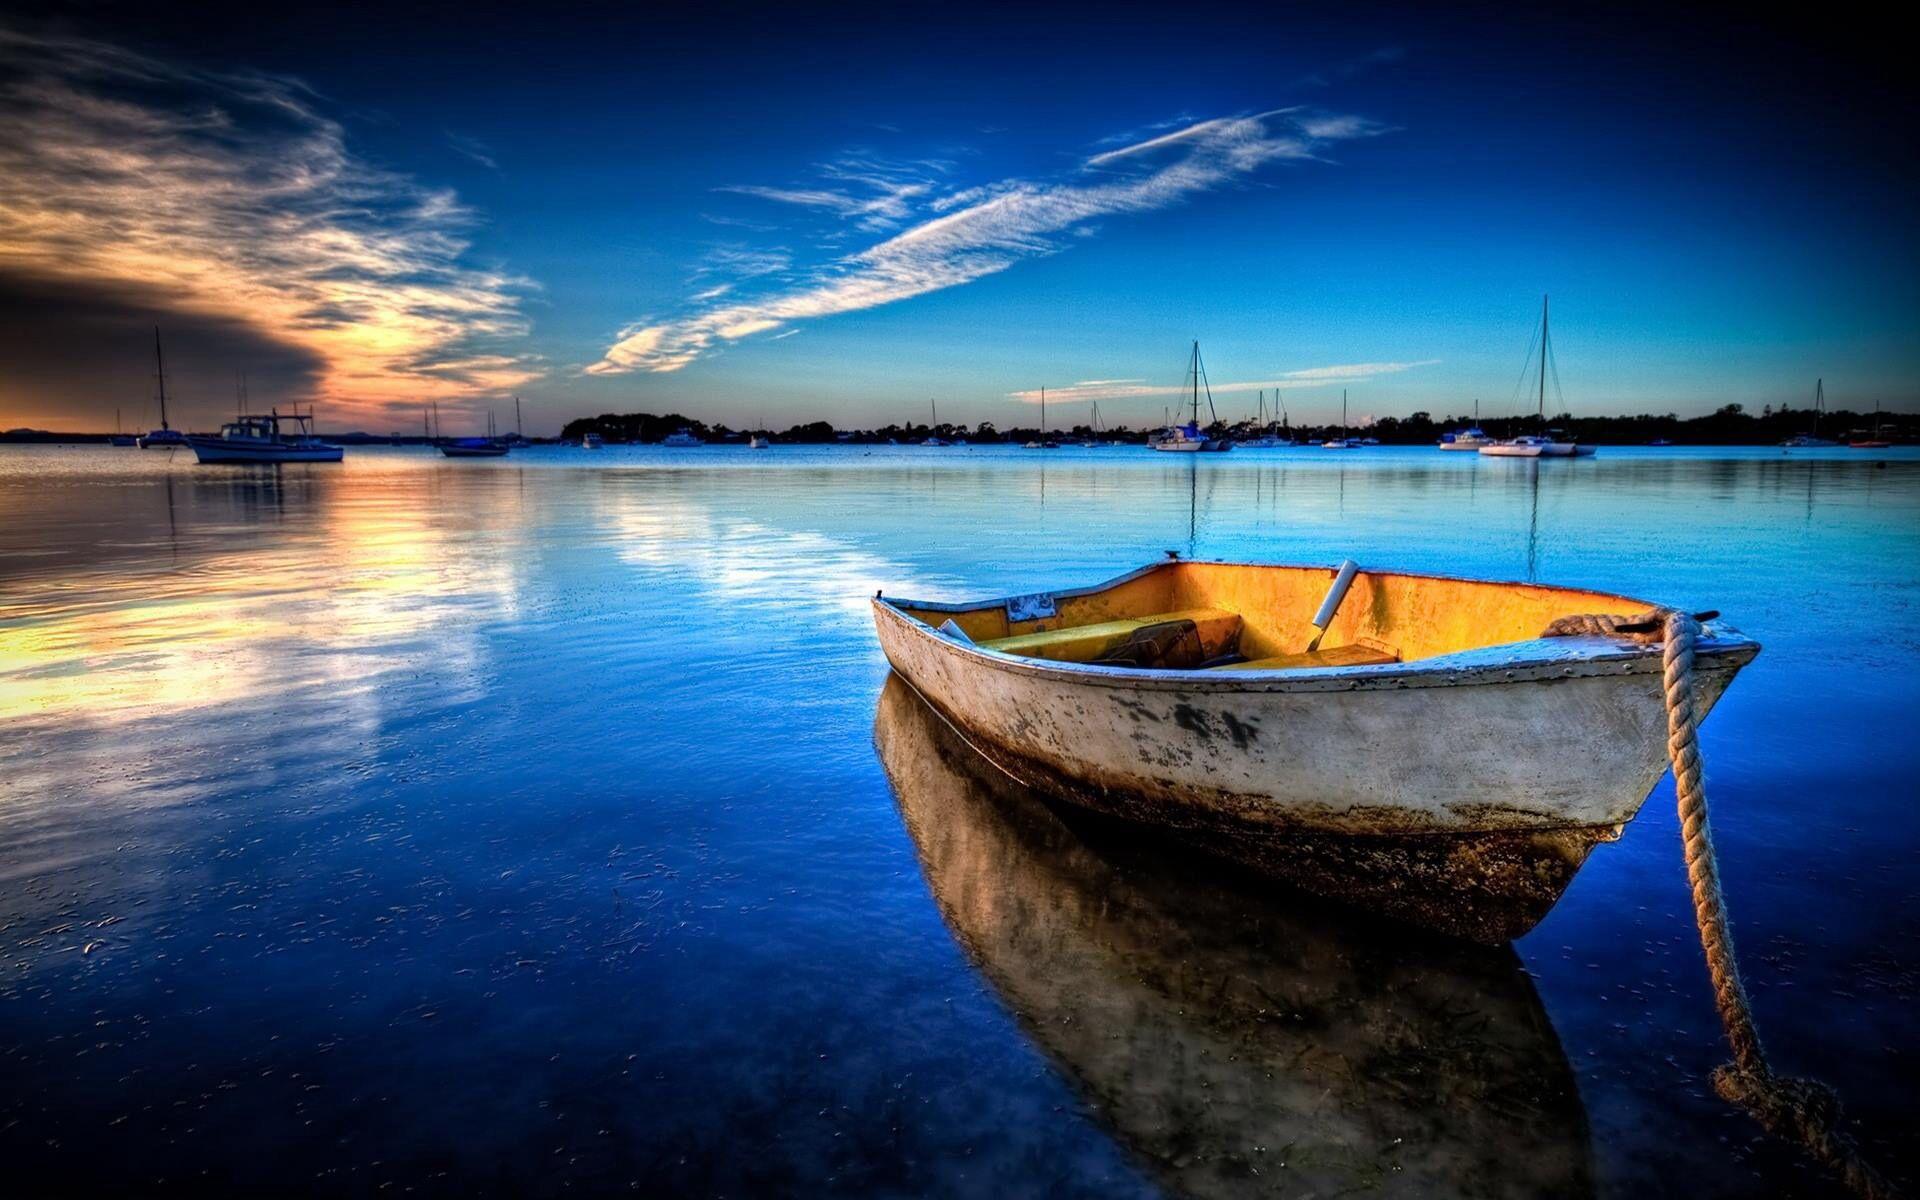 Serene And Peaceful Ocean Landscape Sunset Wallpaper Boat